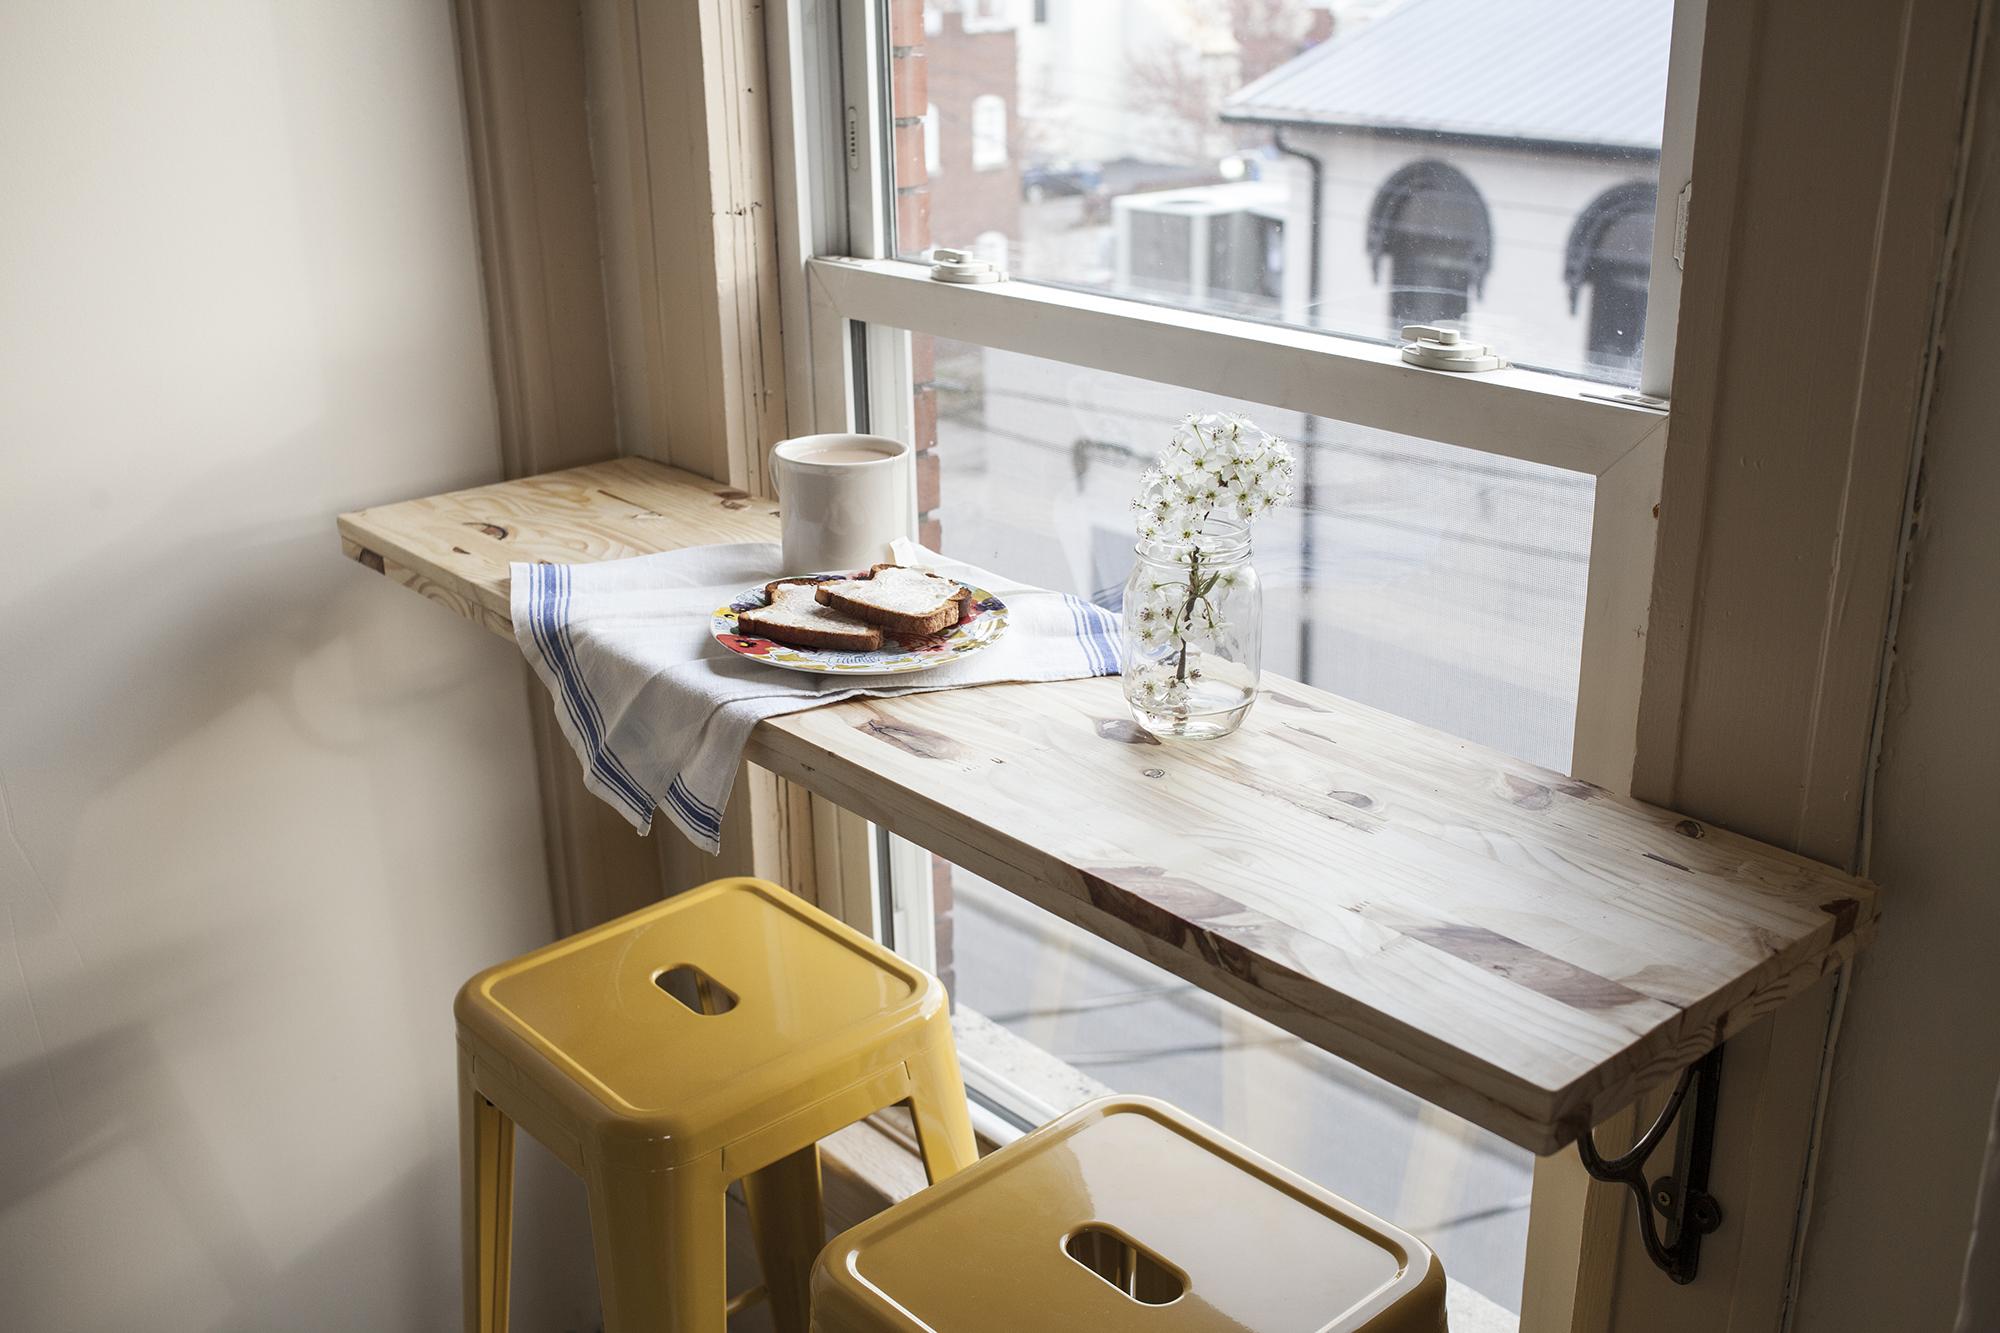 Столик на балкон с плиточной столешницей.